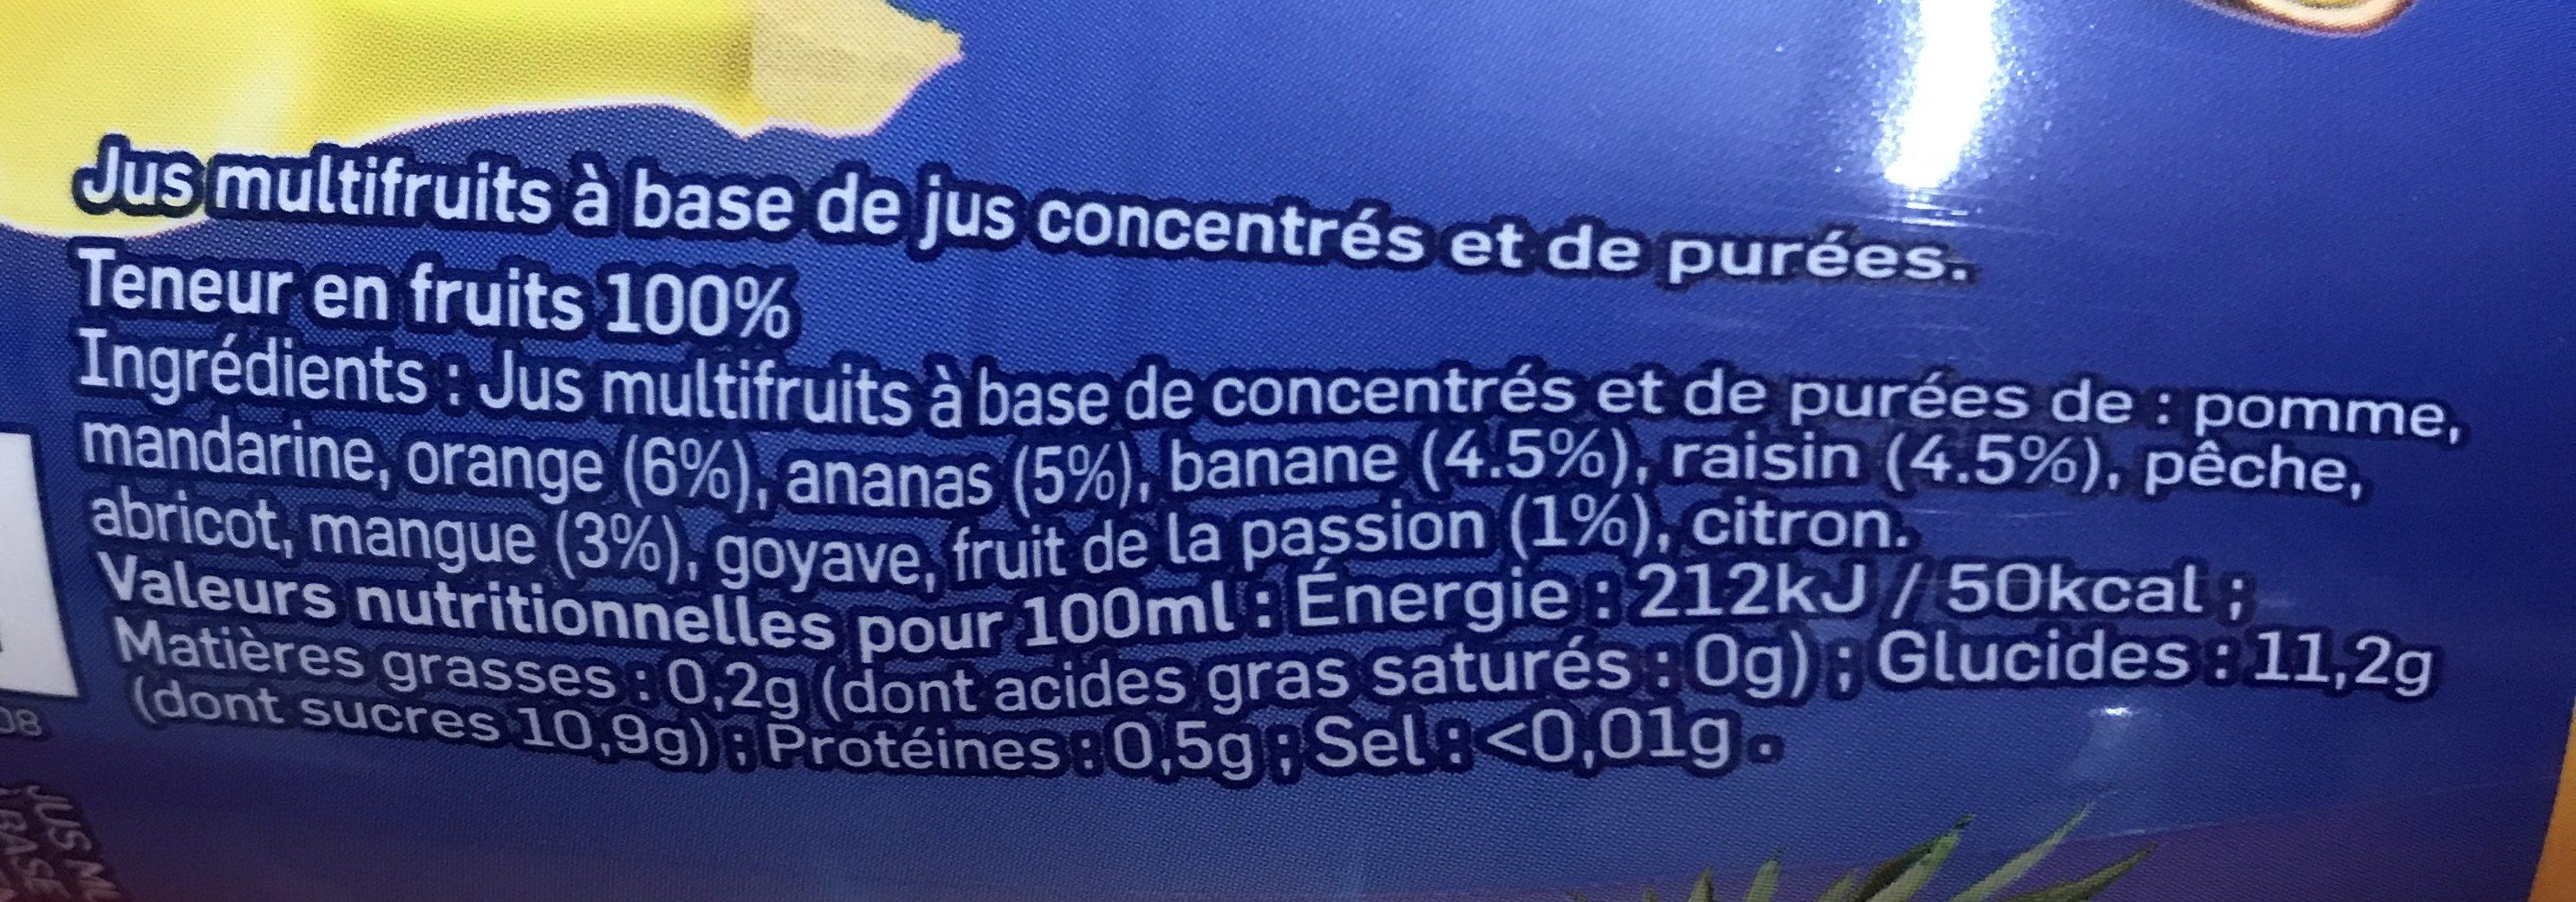 Jus multifruits REA 25cl - Ingredients